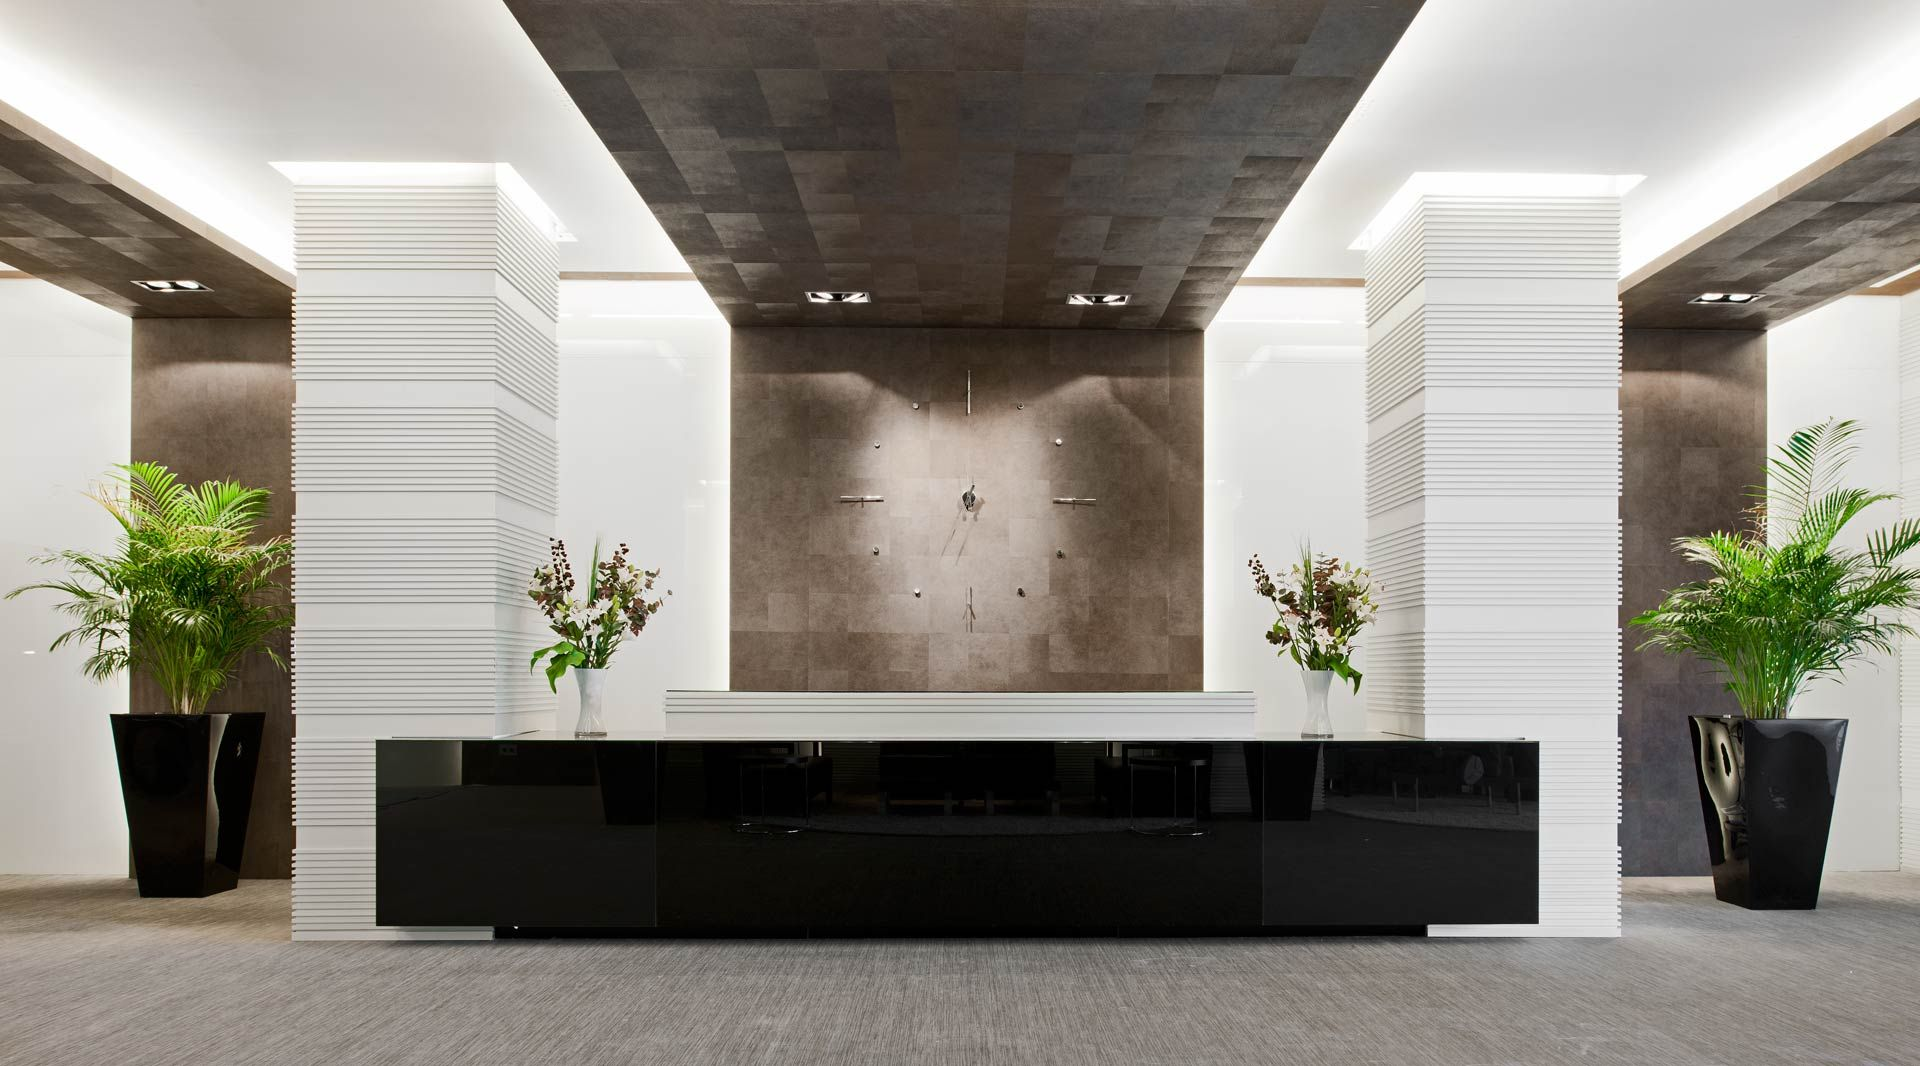 Angyrainside oficinas pinterest recepciones - Decoracion de oficinas modernas ...